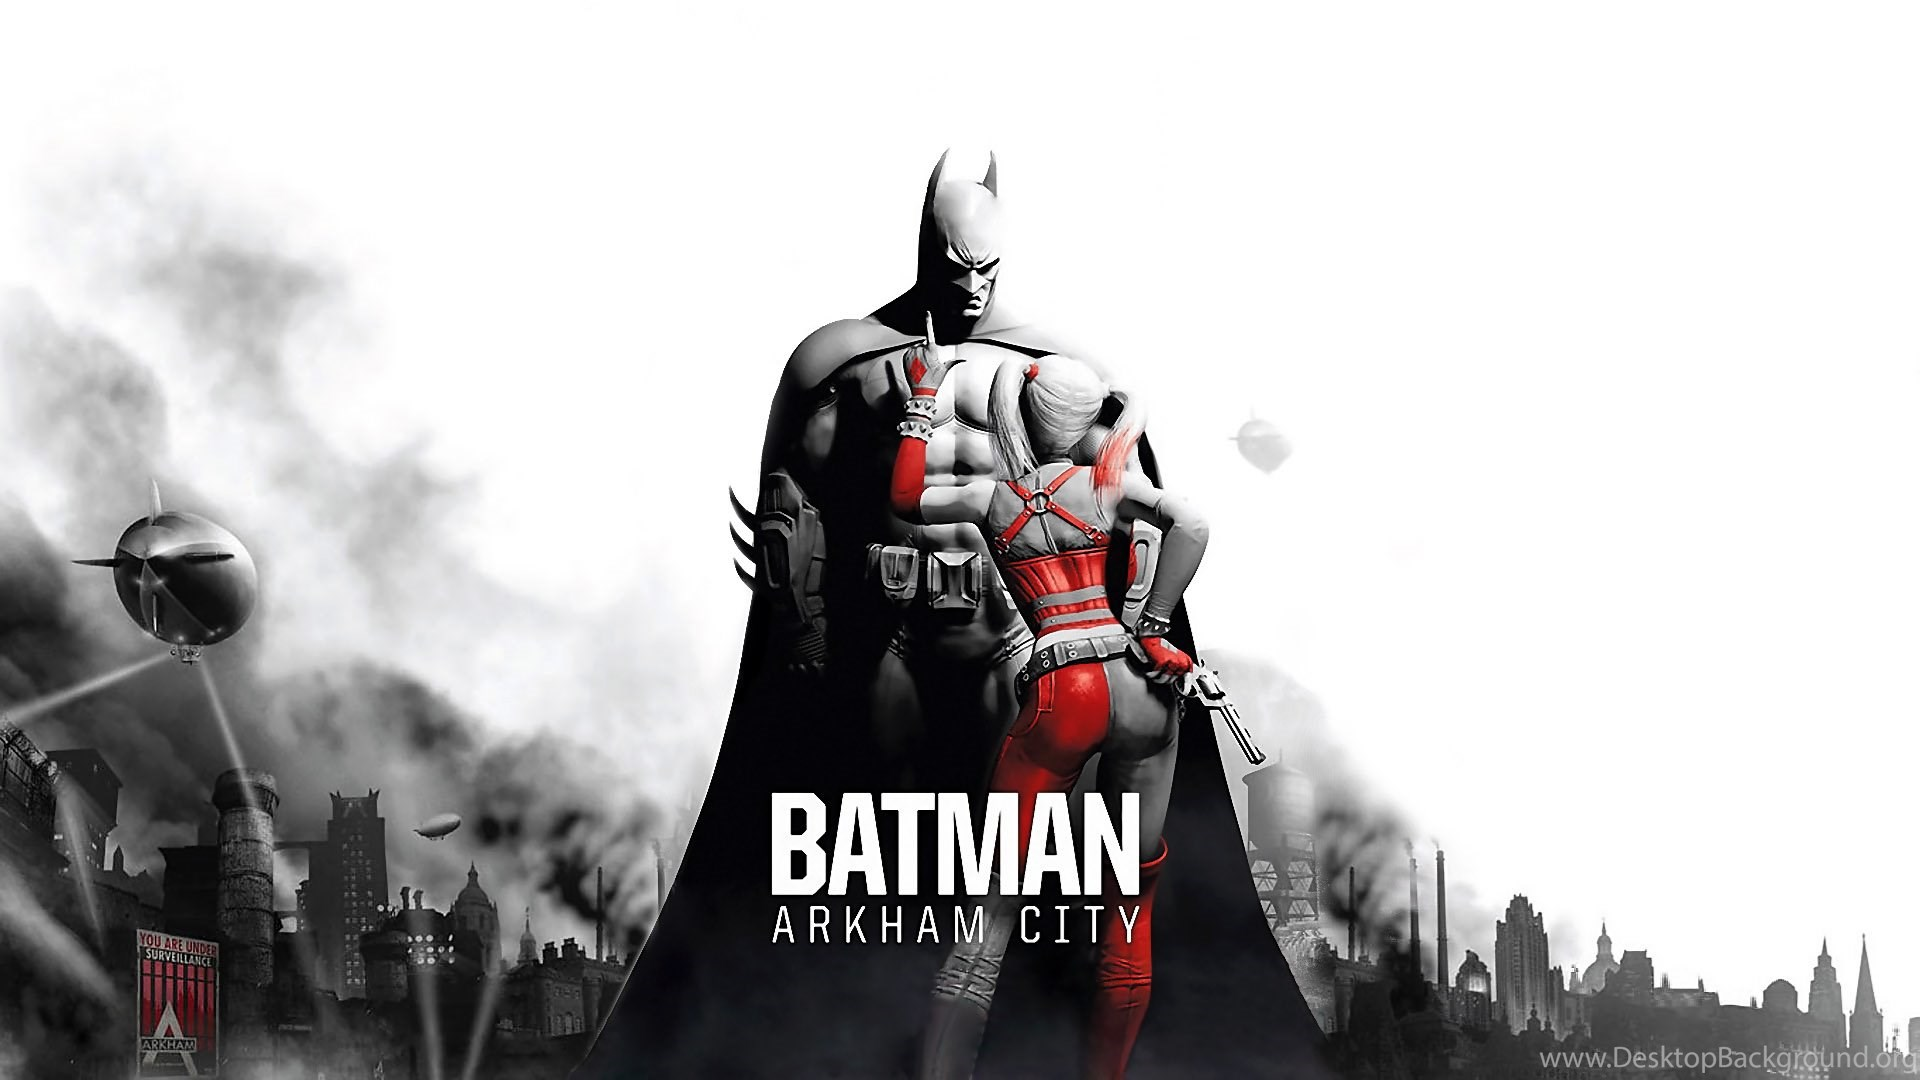 Download The Batman And Harley Quinn Wallpaper Batman And Harley